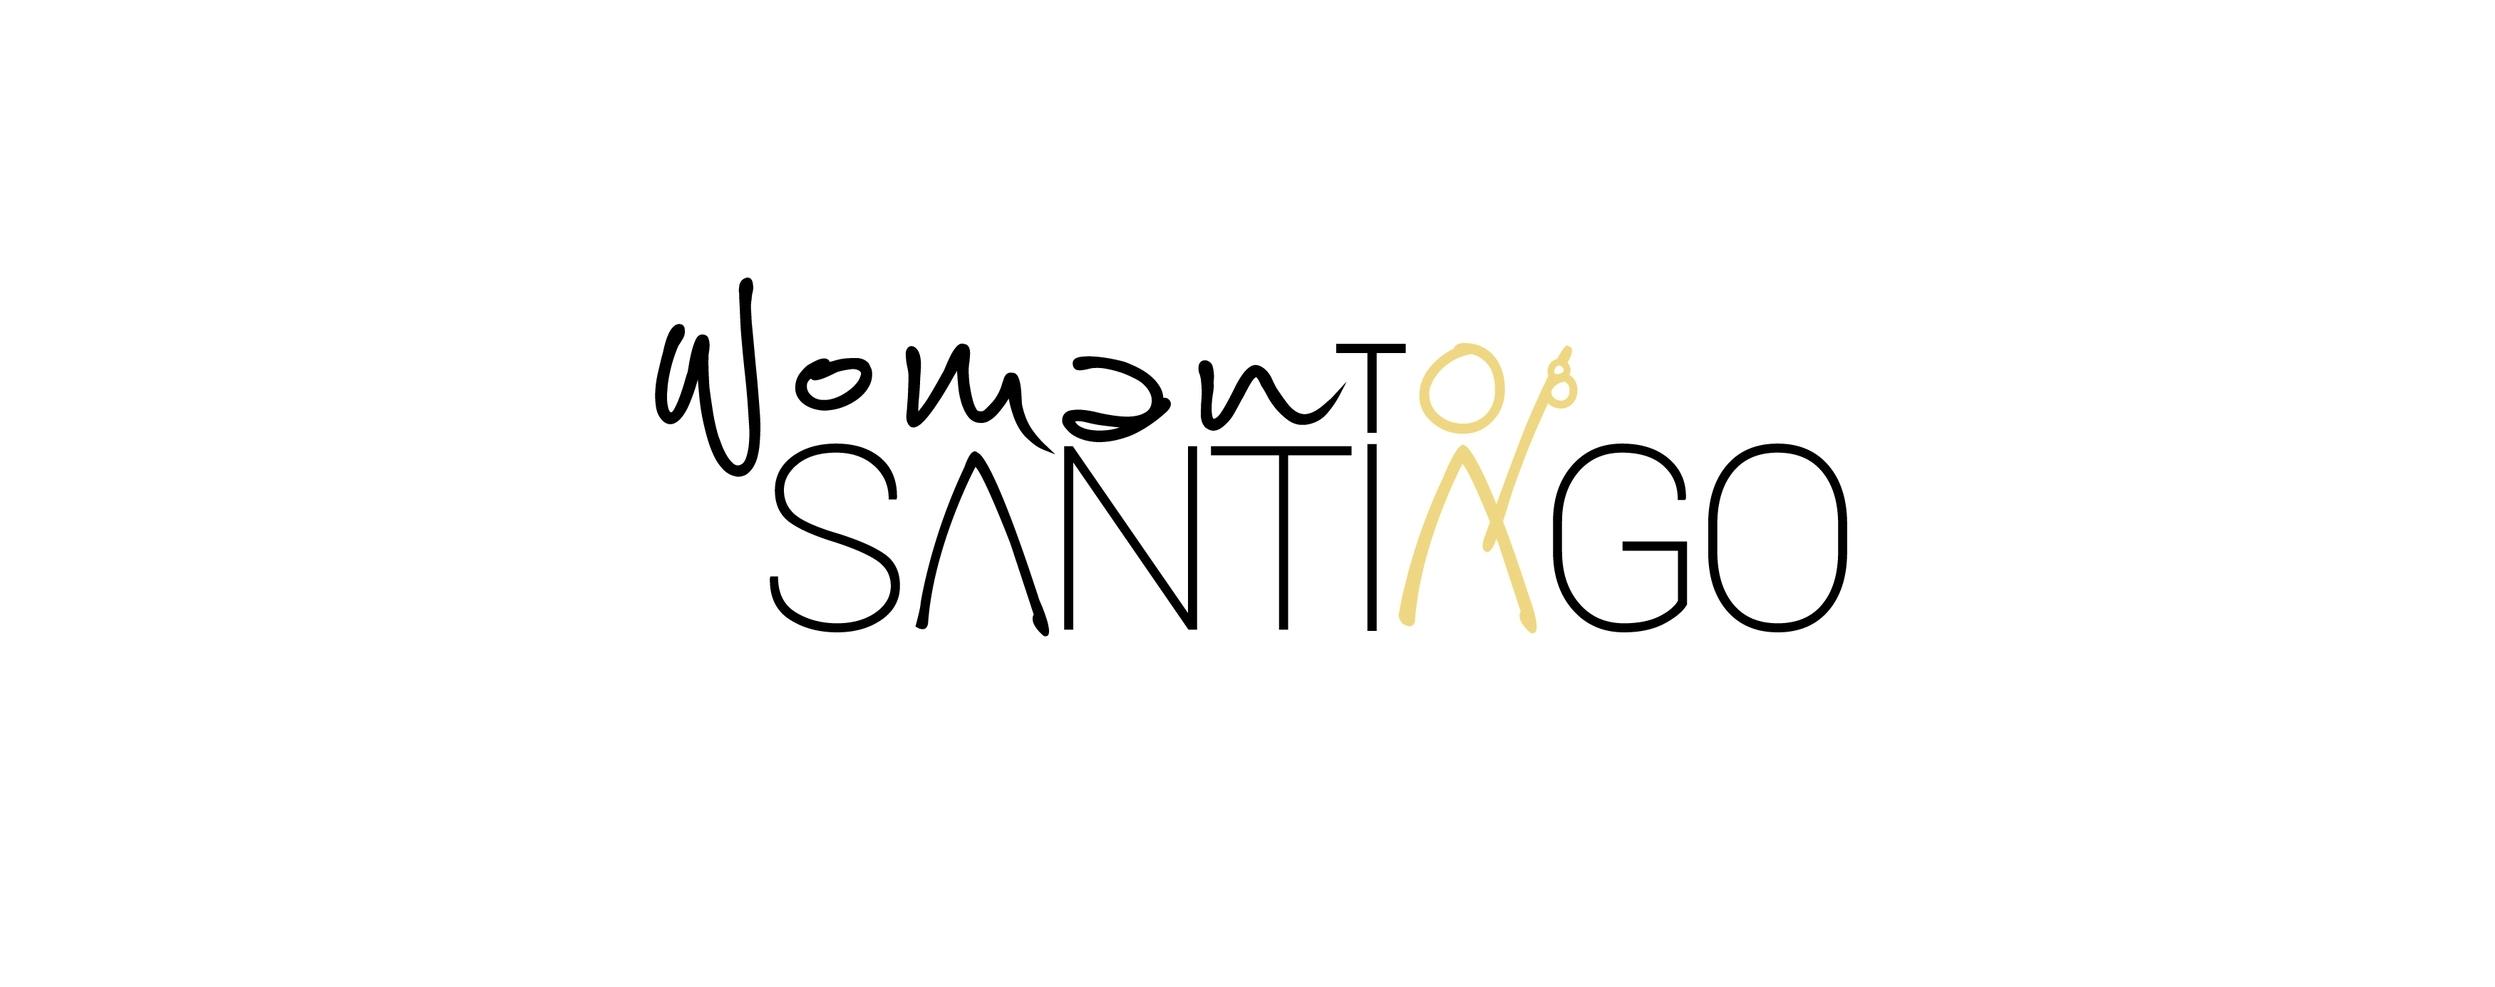 logotipo_womantosantiago_mdebenito-01 copia.jpg